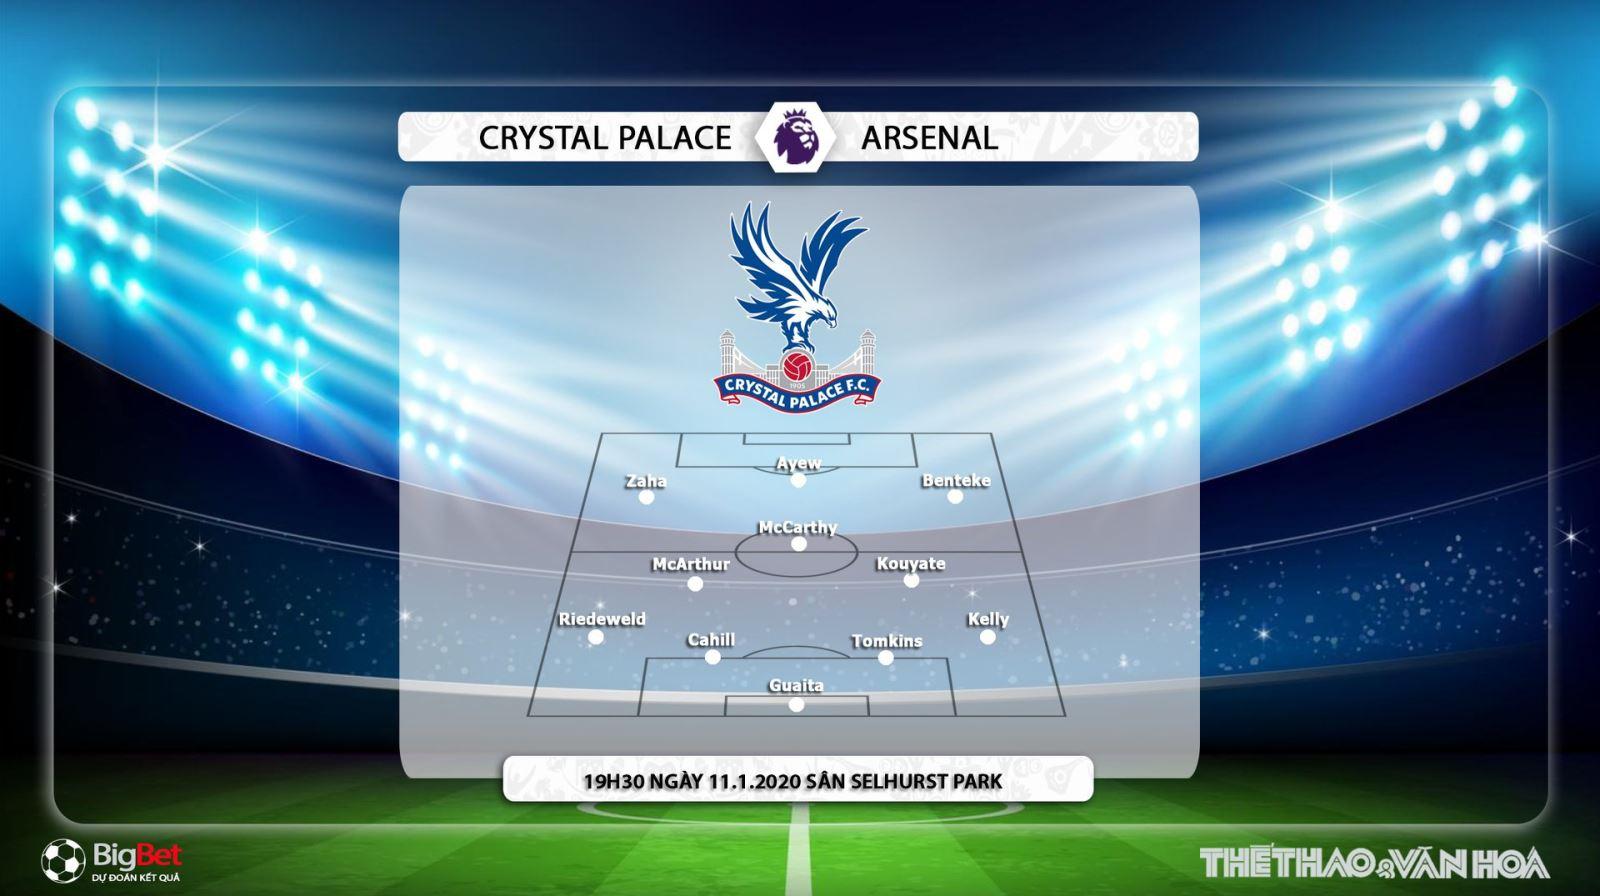 Crystal Palace vs Arsenal, Arsenal, trực tiếp bóng đá, trực tiếp Crystal Palace vs Arsenal, nhận định Crystal Palace vs Arsenal, dự đoán Crystal Palace vs Arsenal